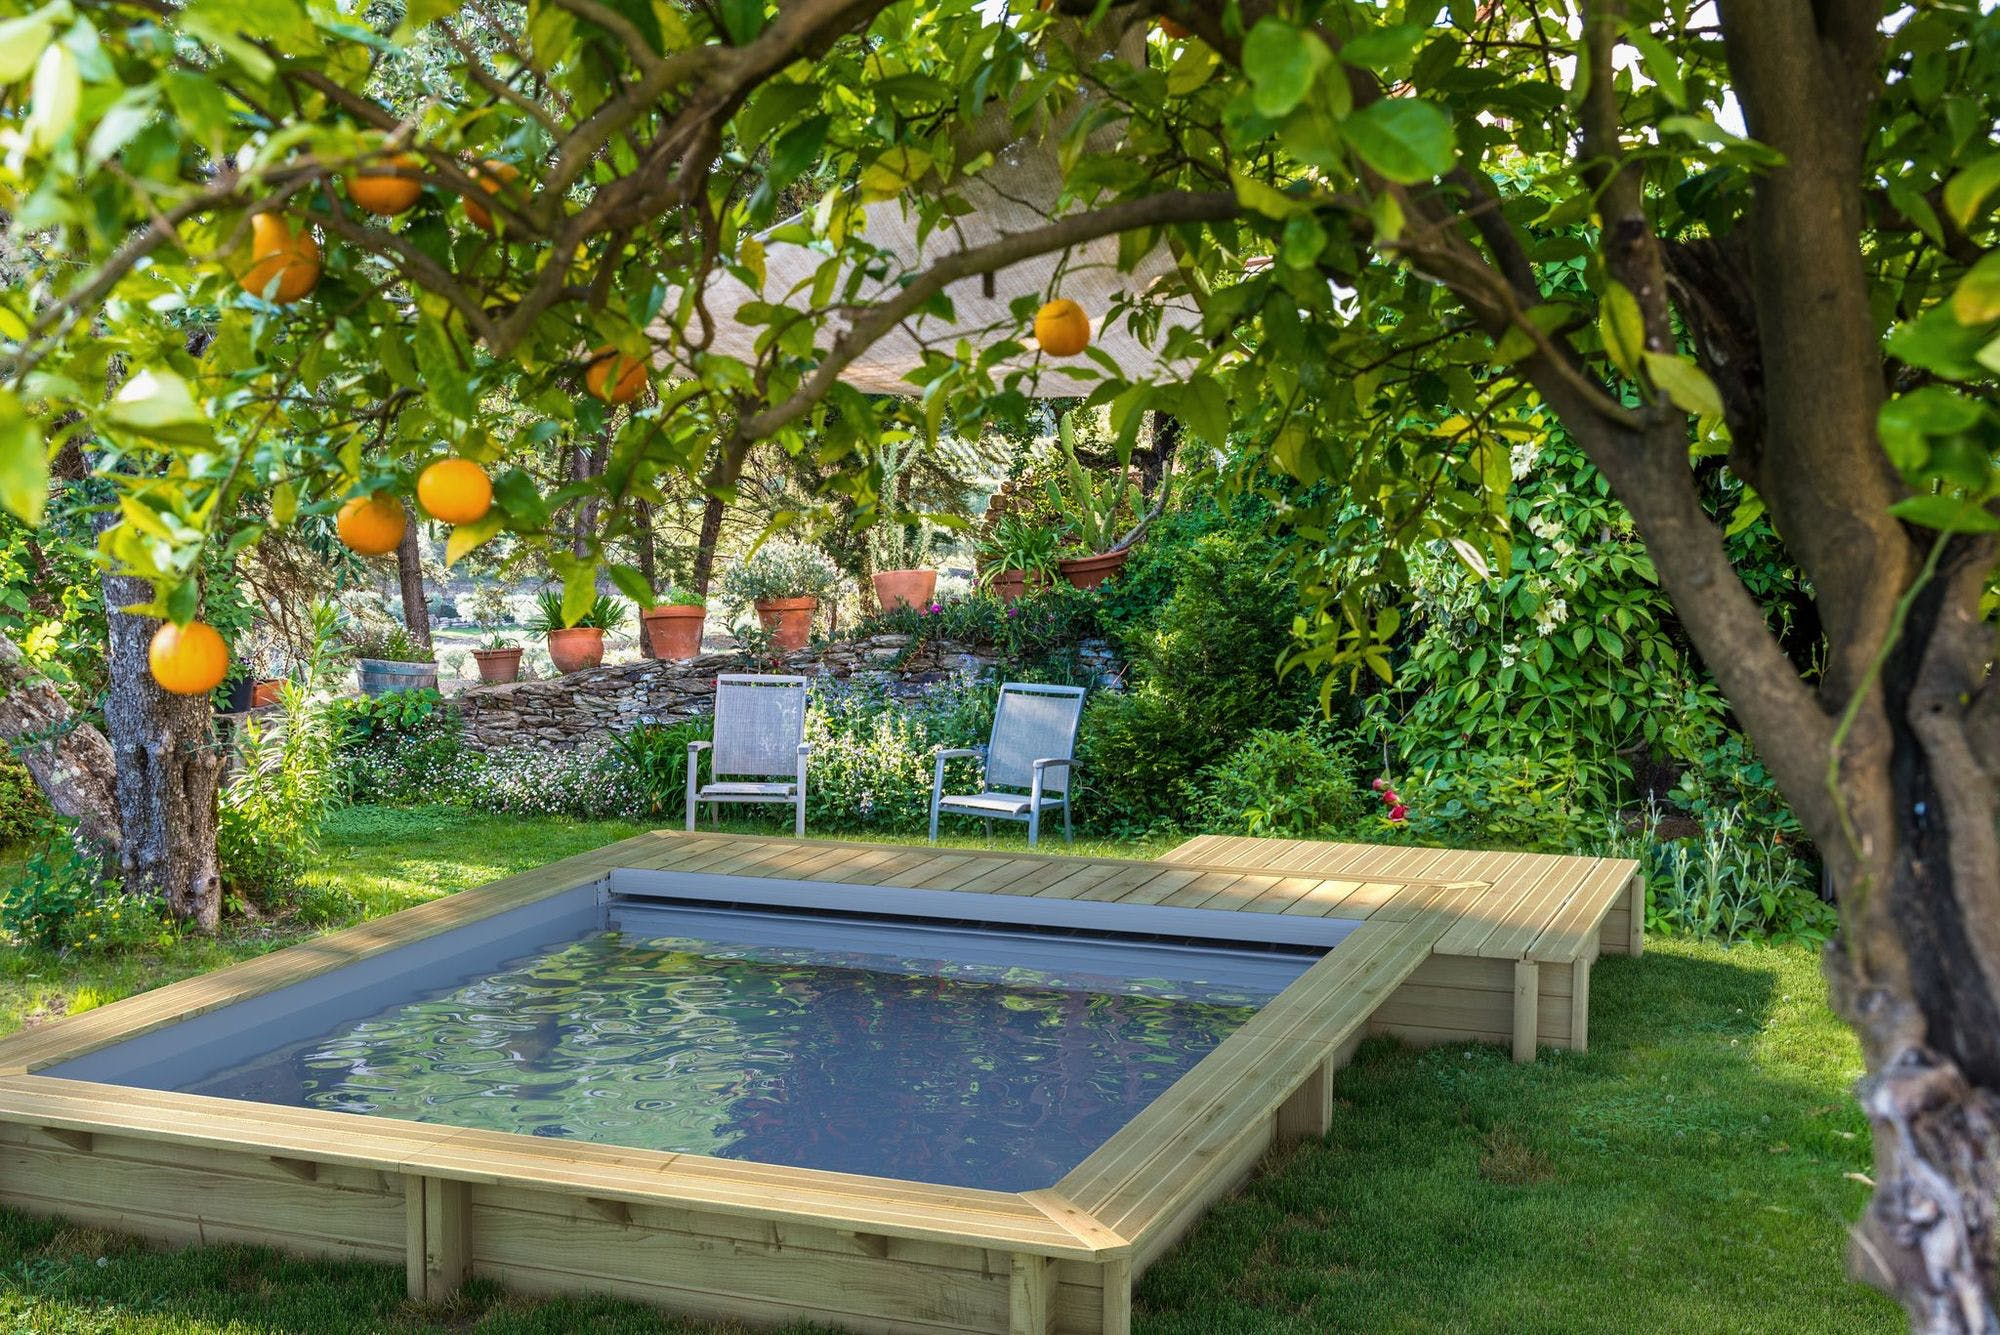 piscine hors sol rectangulaire en bois dans un jardin